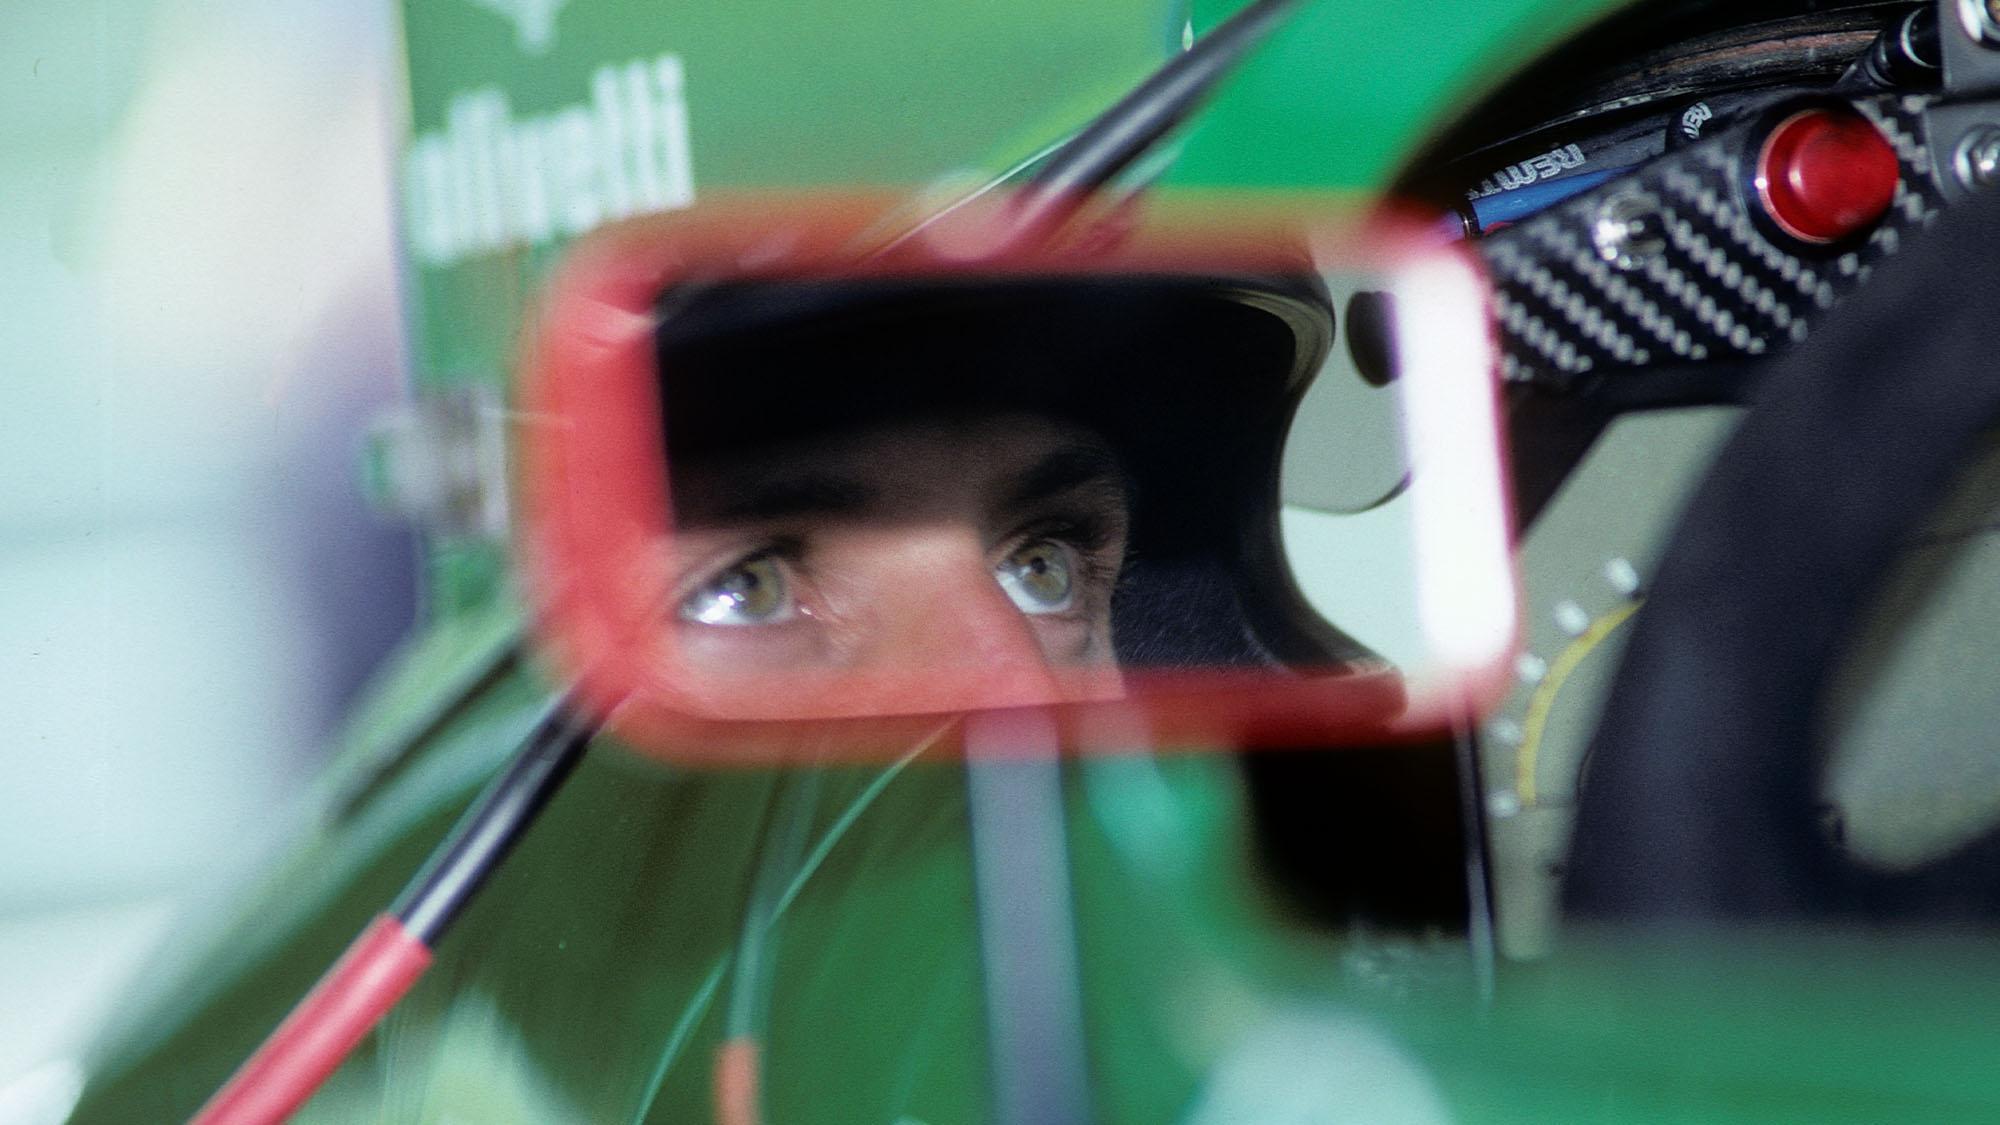 Michael Schumacher, Jordan-Ford 191, Grand Prix of Belgium, Spa Francorchamps, 25 August 1991. Michael Schumacher's eyes show his concentration. (Photo by Paul-Henri Cahier/Getty Images)